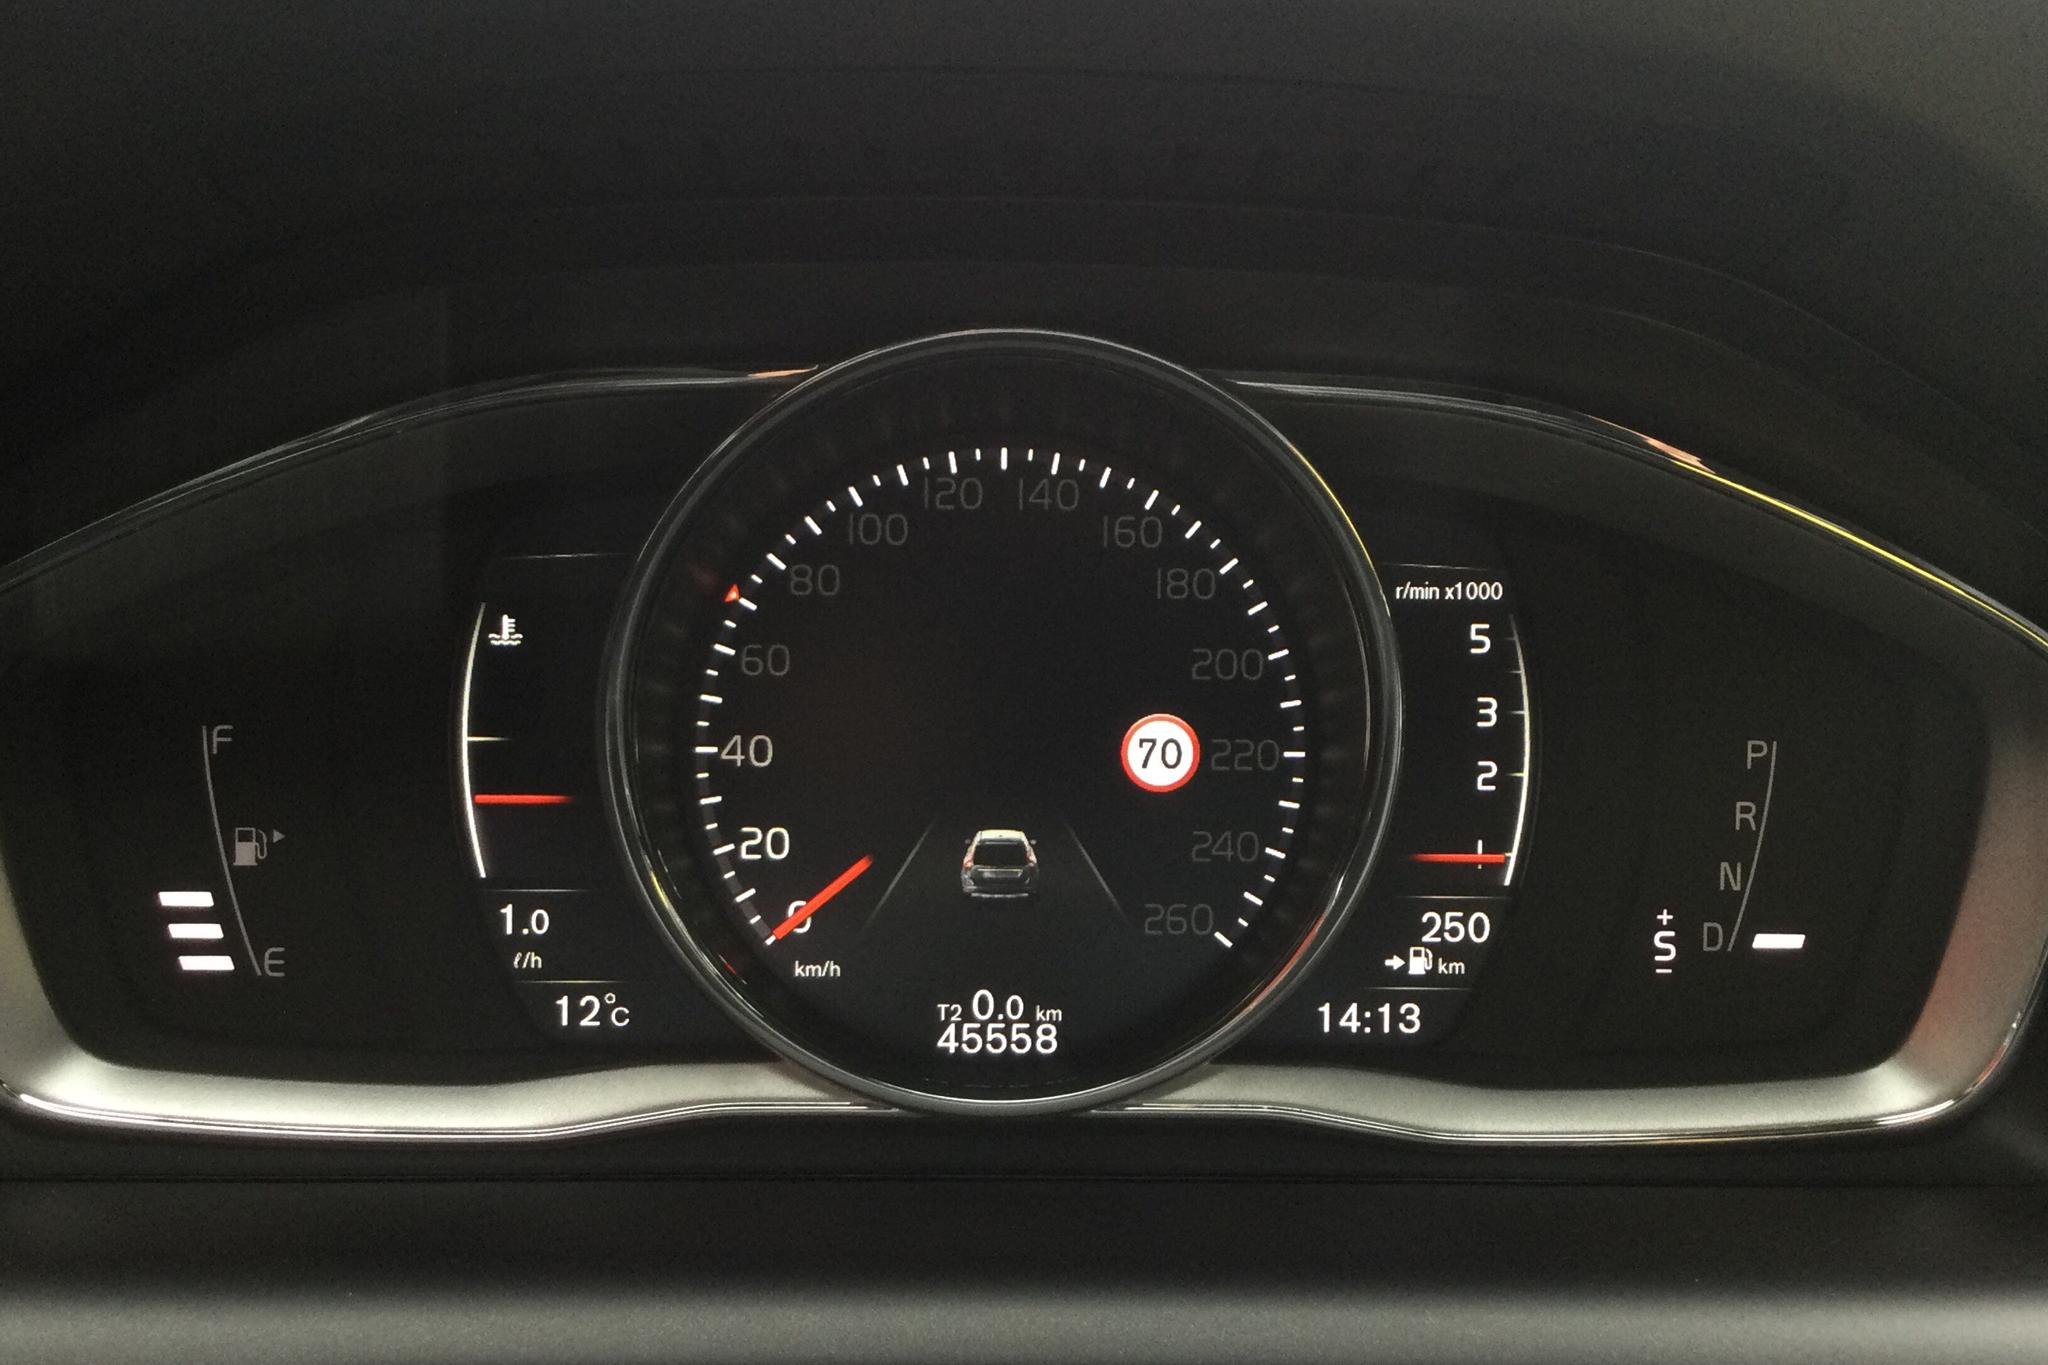 Volvo XC60 D4 2WD (190hk) - 45 550 km - Automatic - gray - 2017